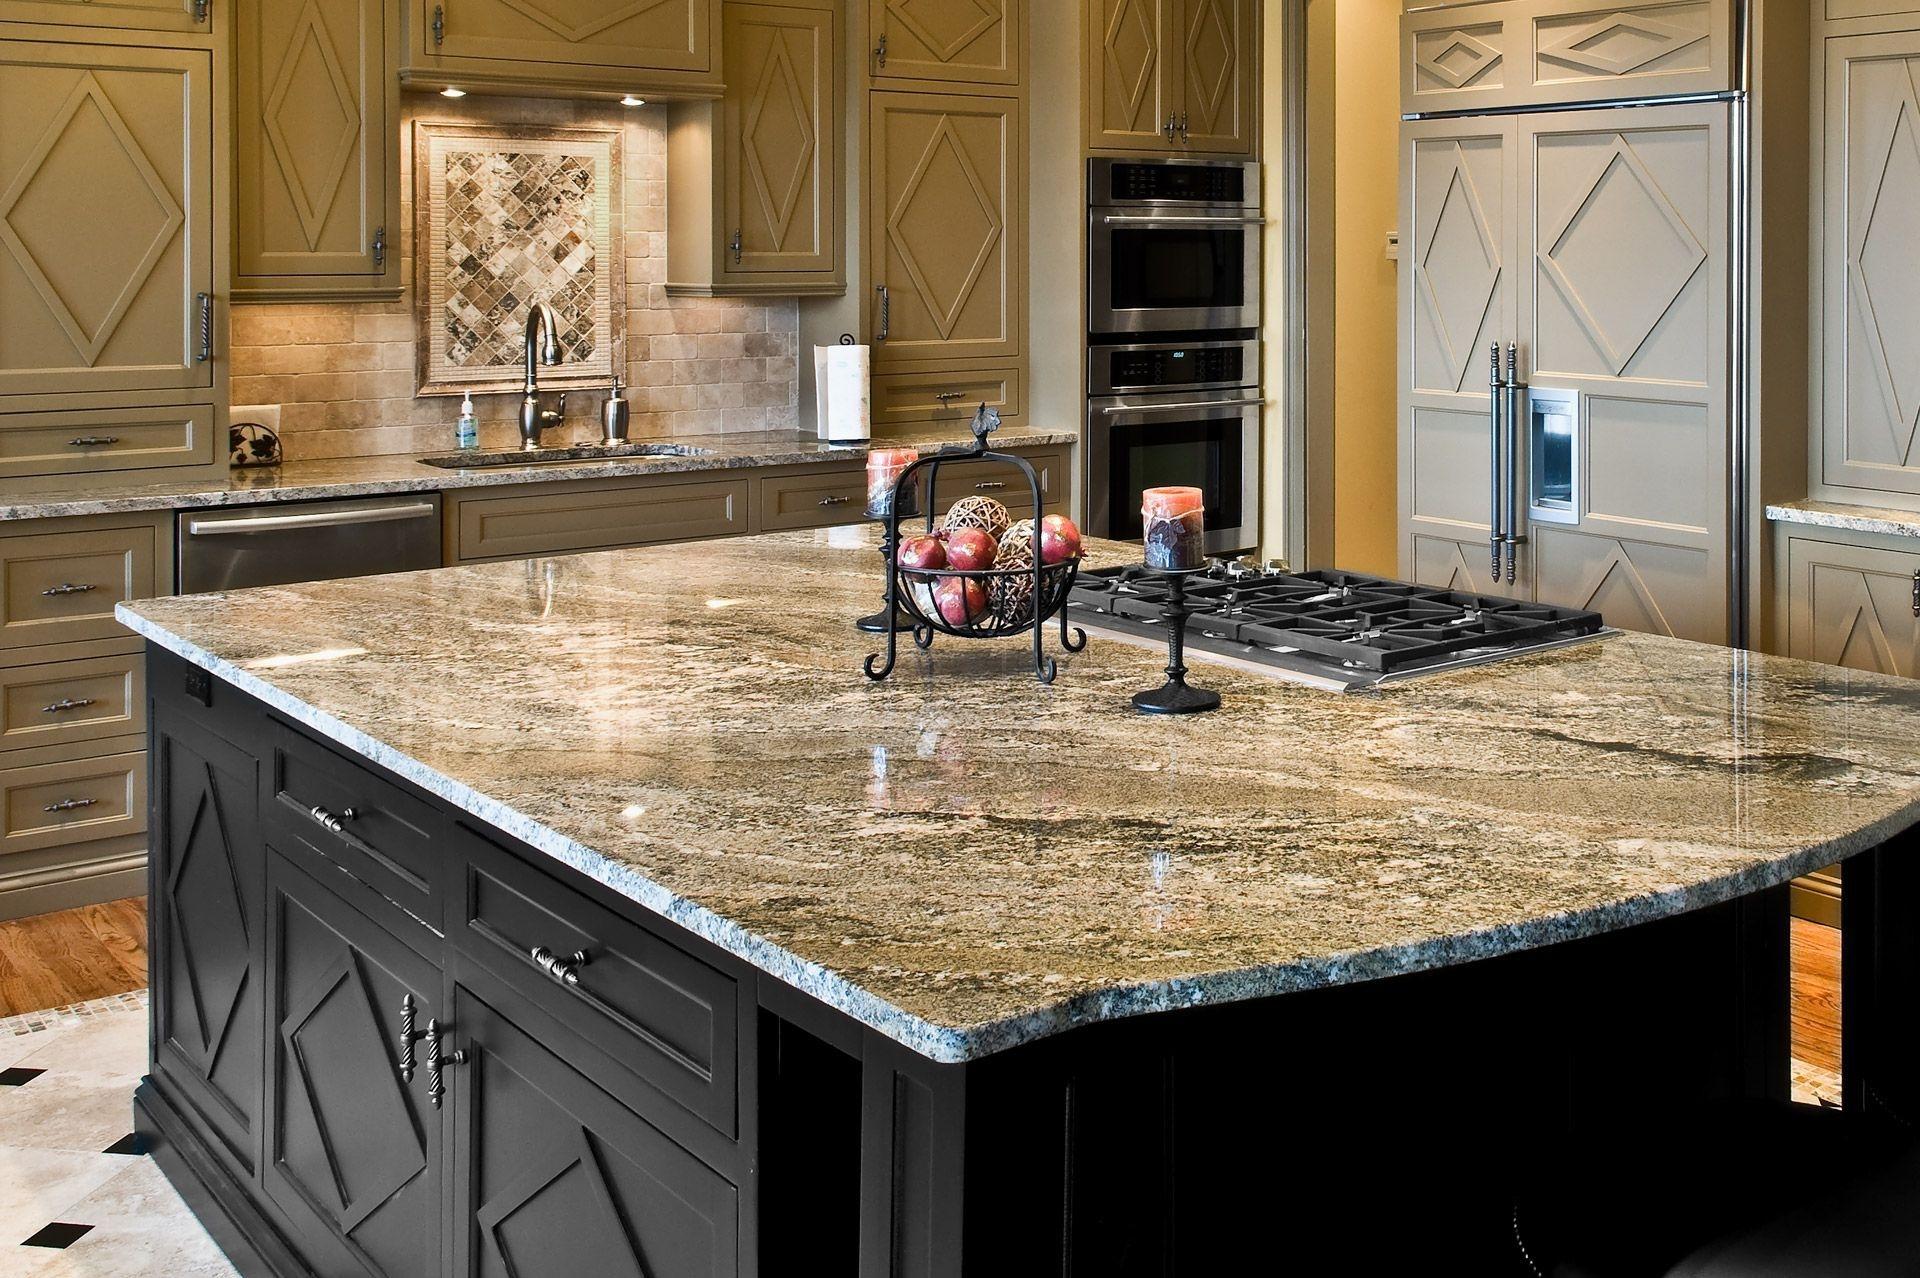 Admiring Granite Kitchen Countertops Ideas That You Shouldnt Miss10